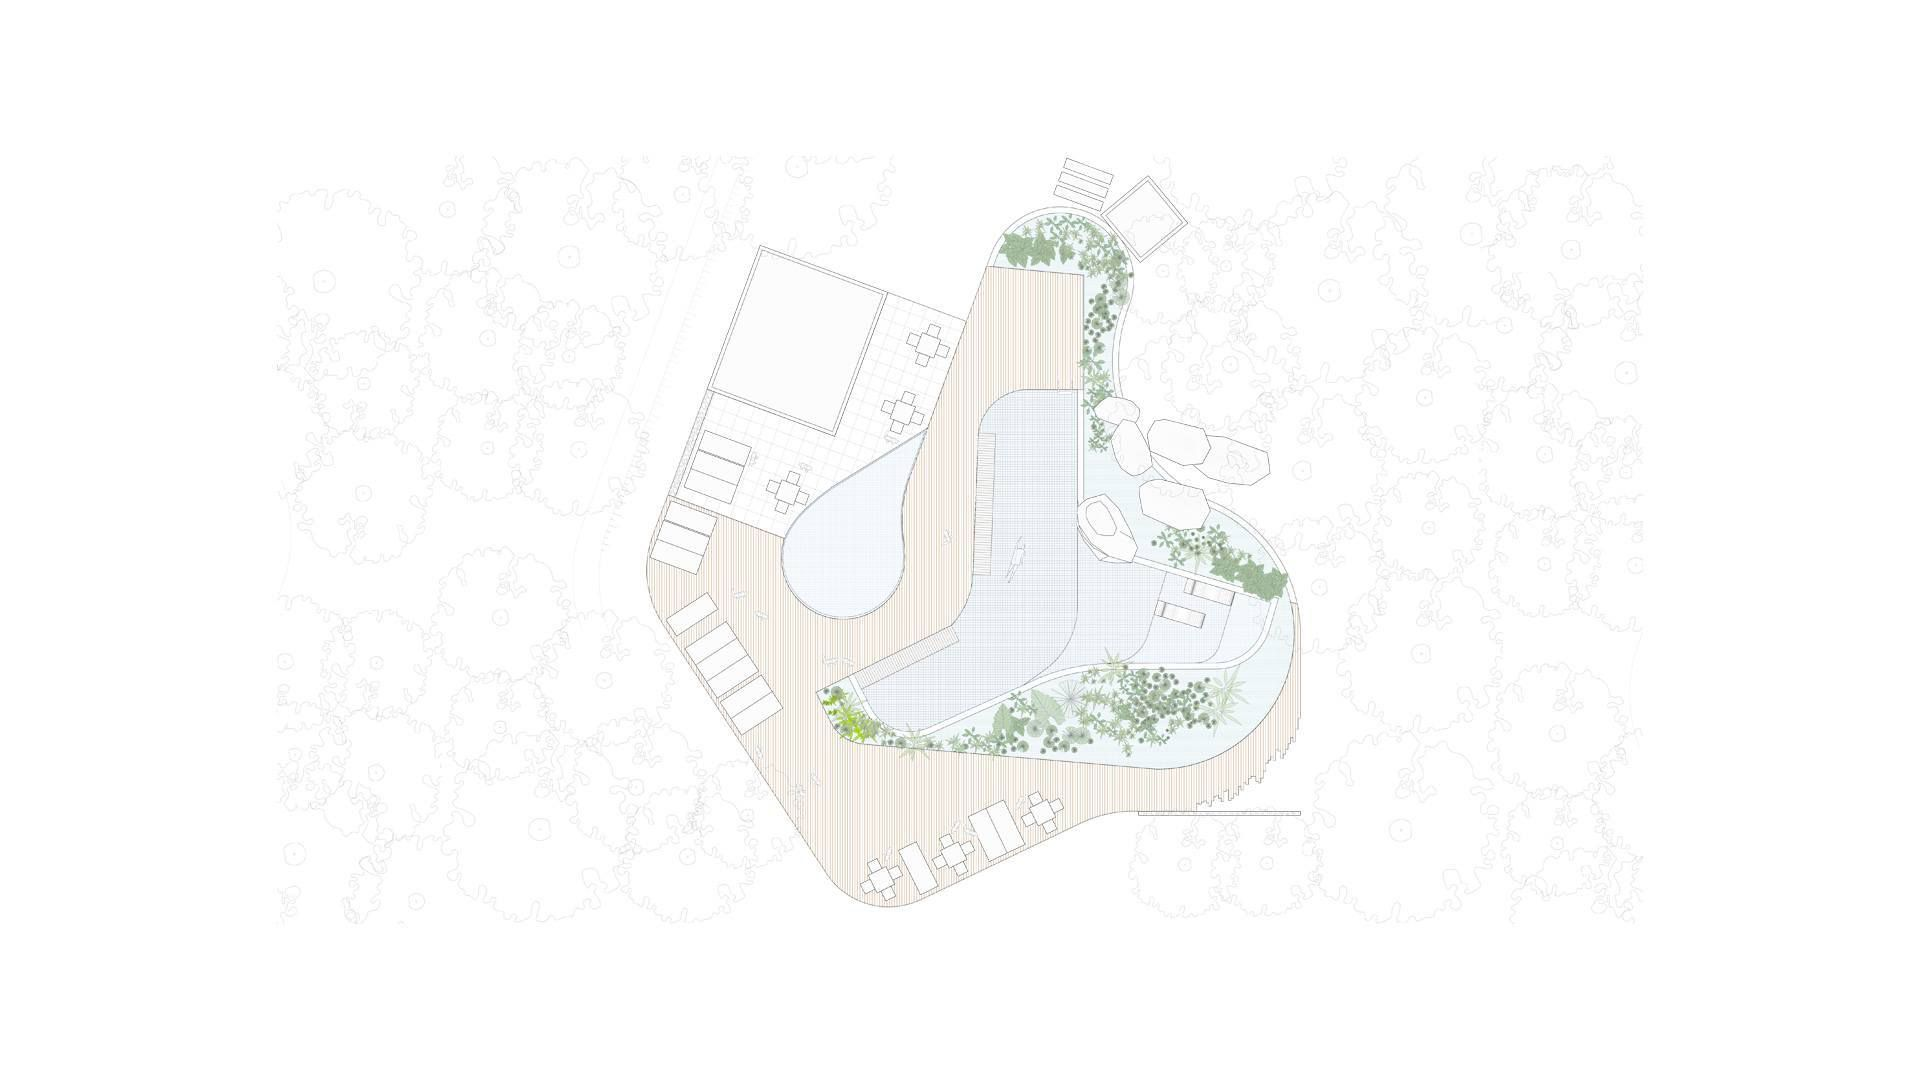 22_piscina-spa-botanique-planta-depois-colorida